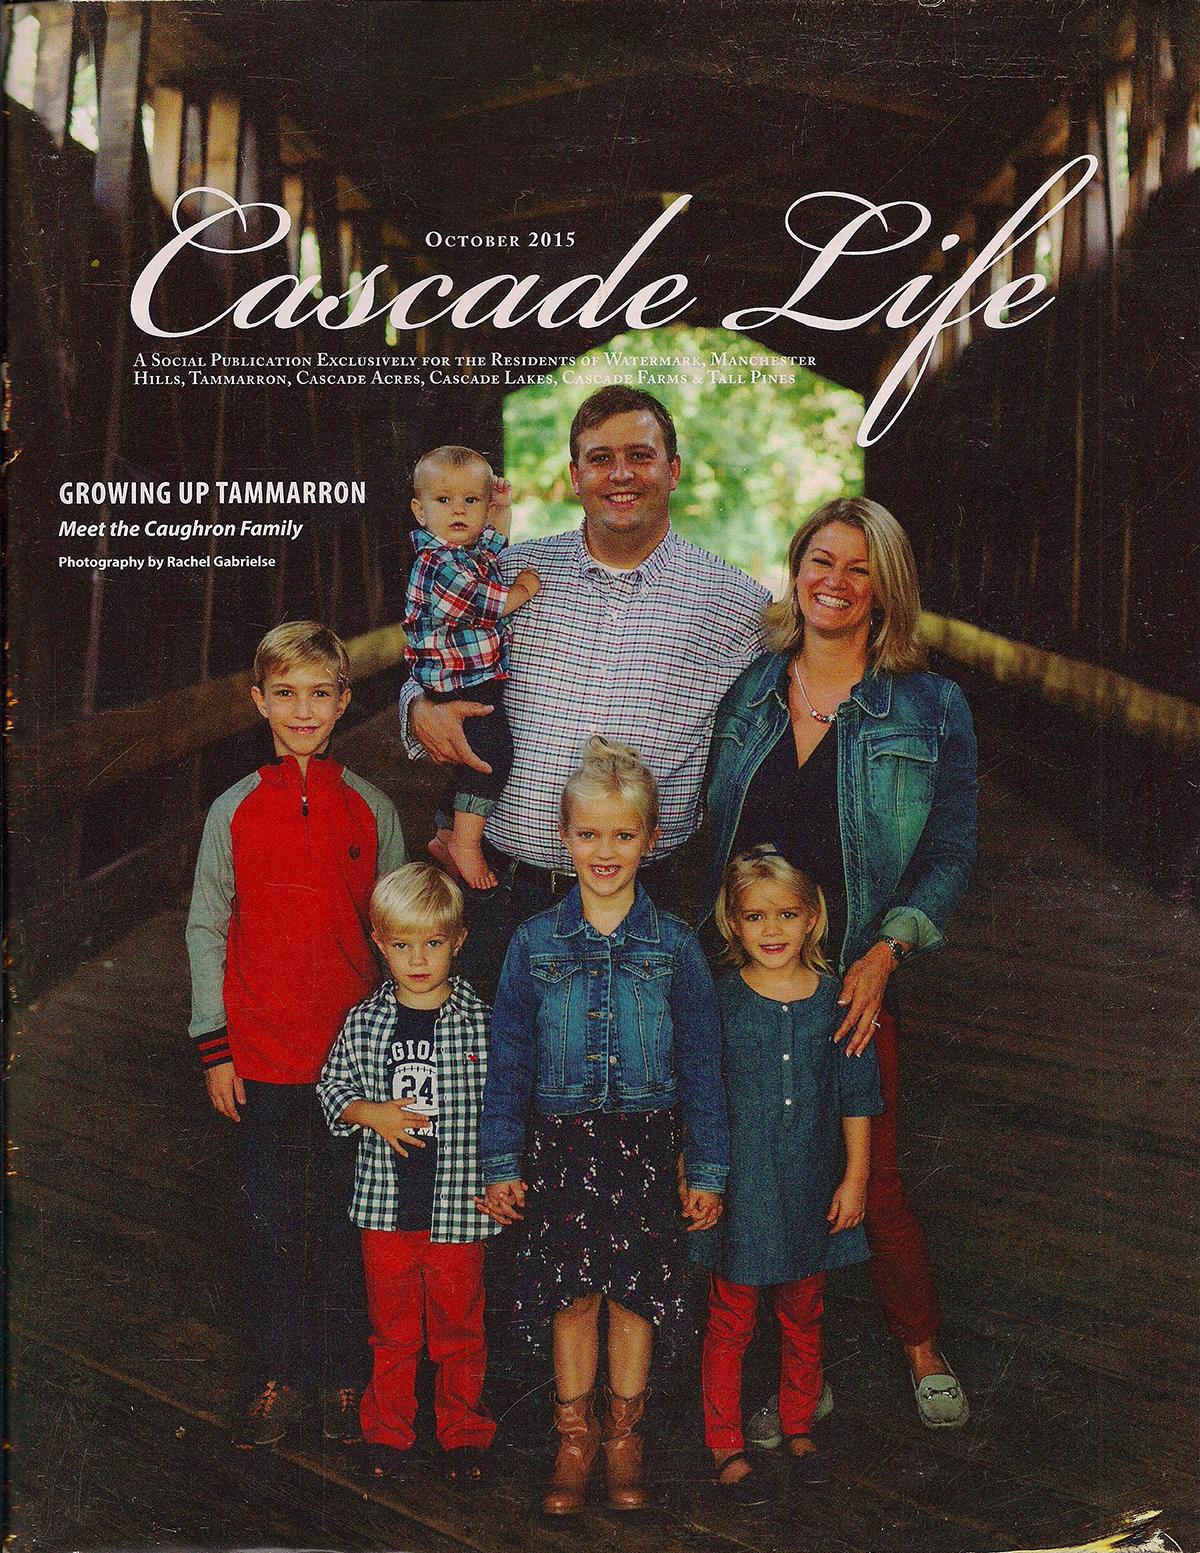 Oct2015-CascadeLife-cover.jpeg